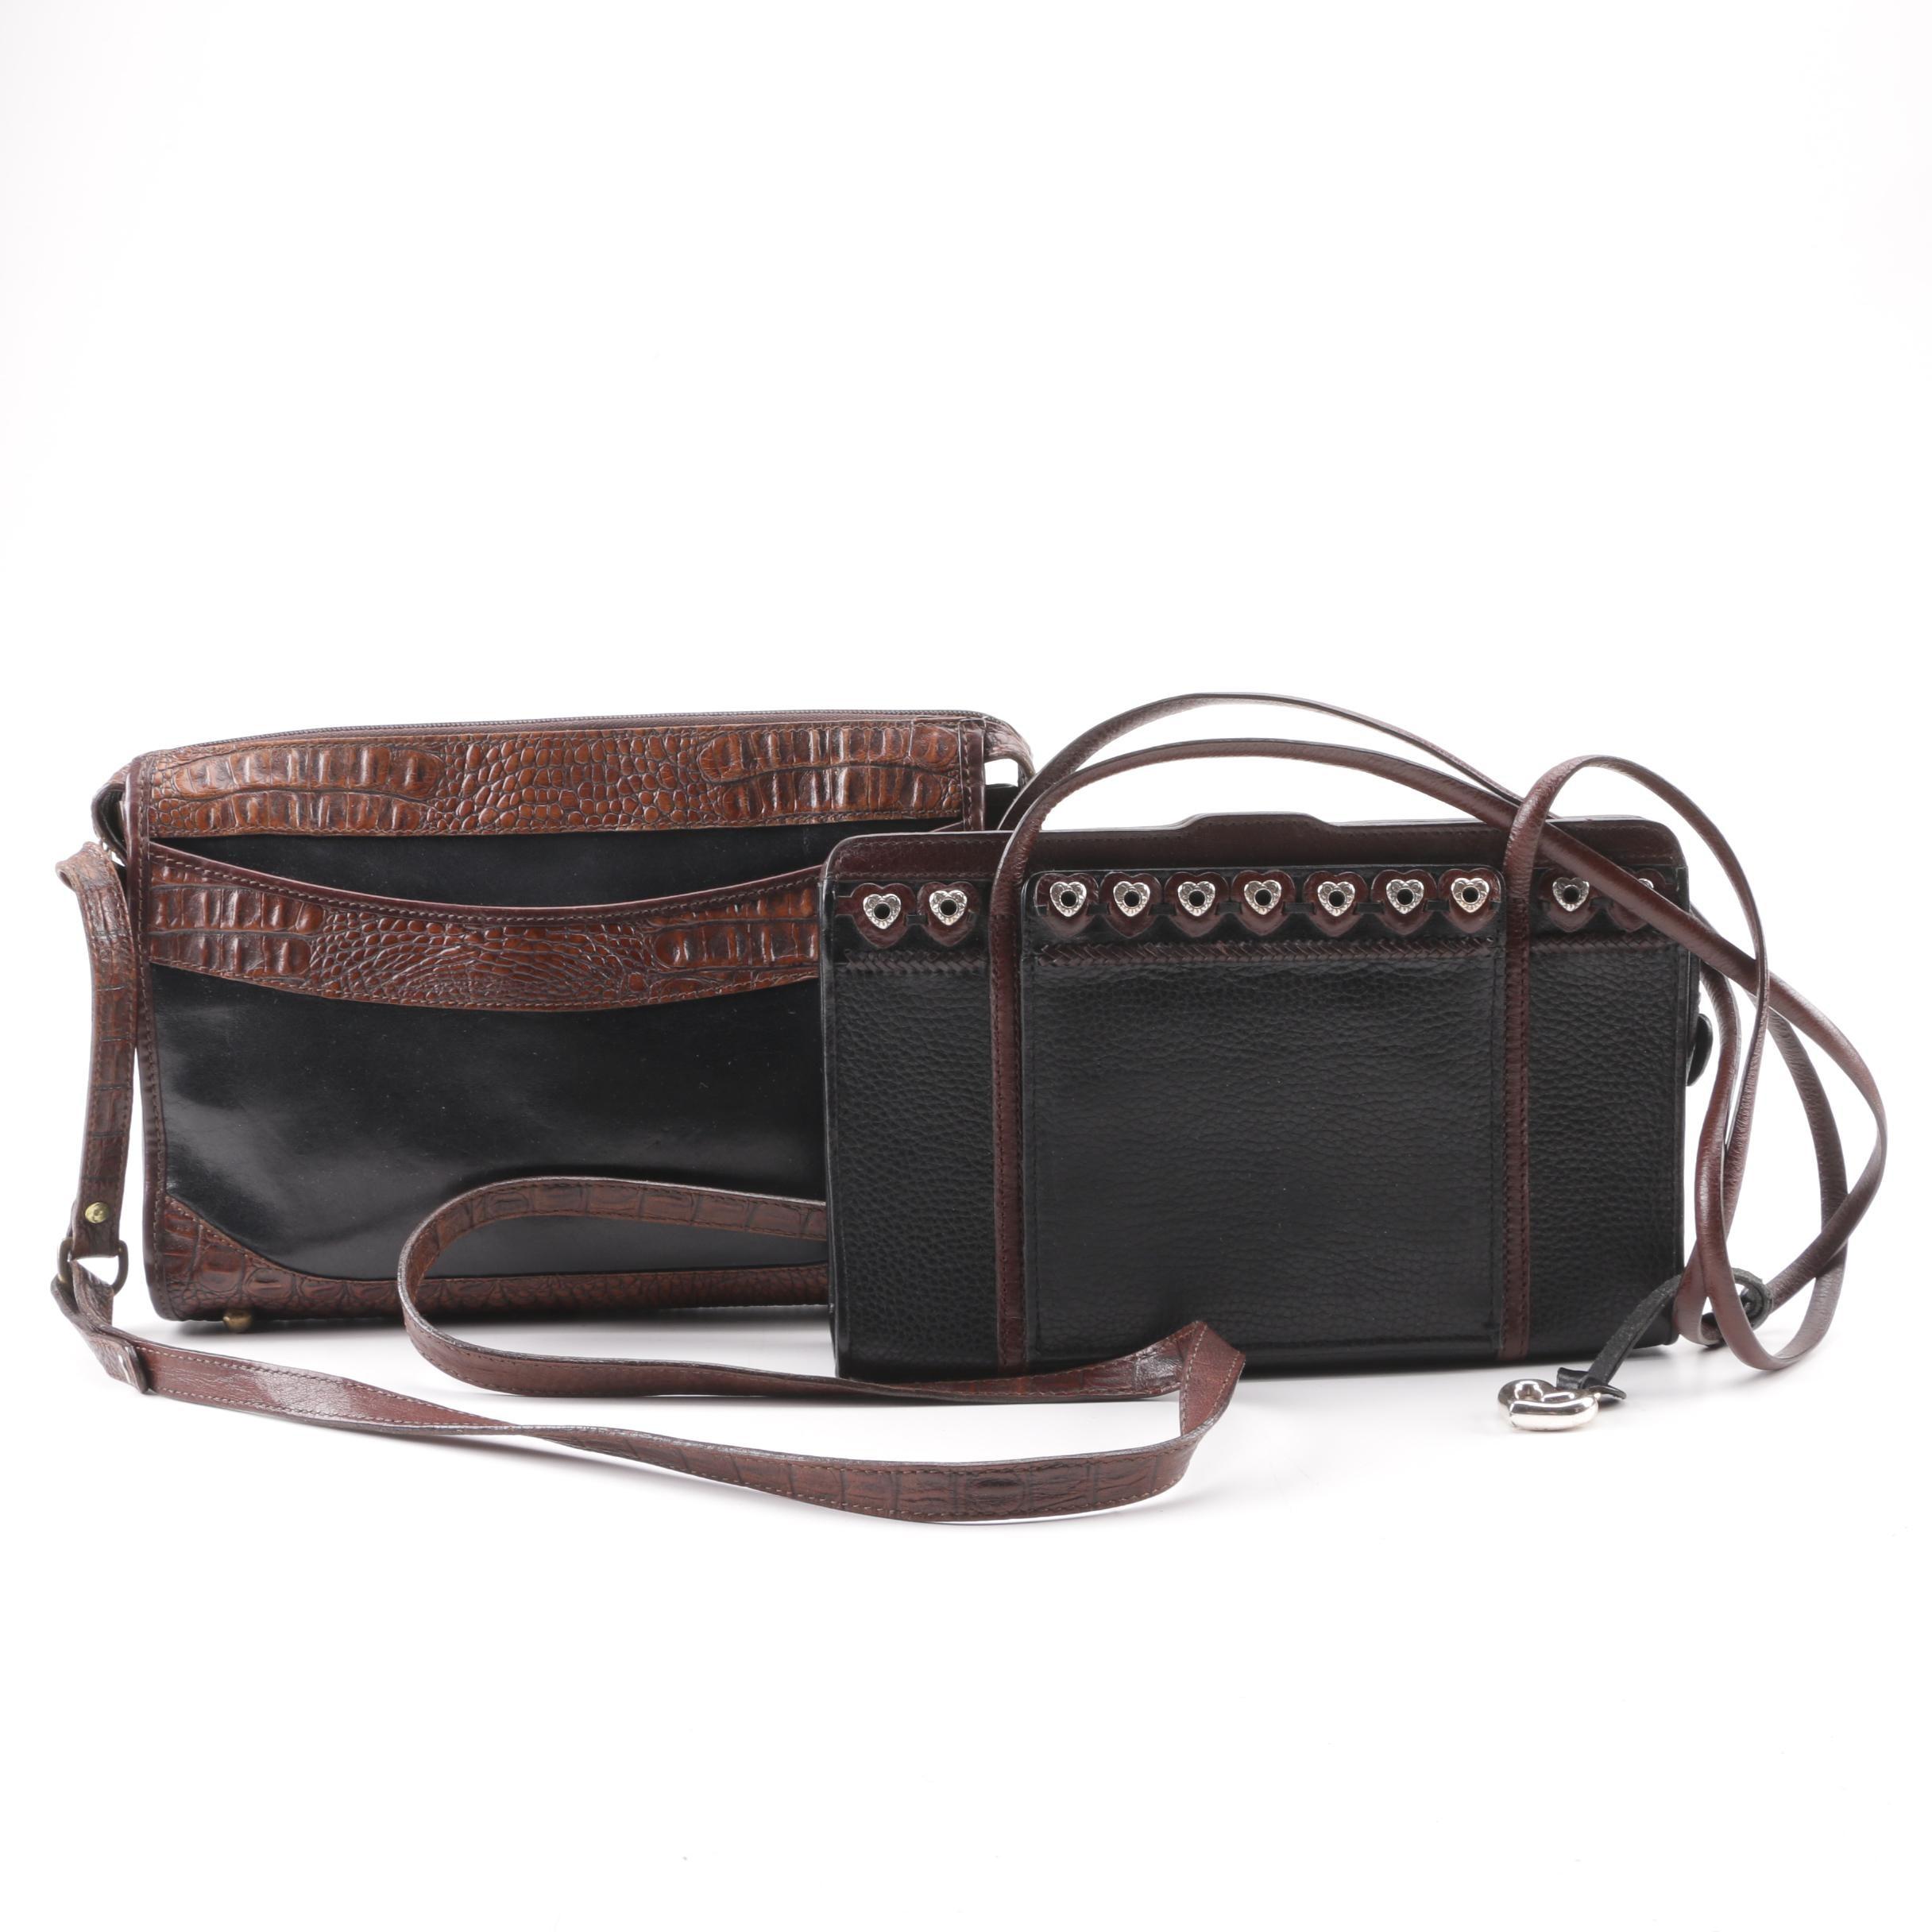 Brahmin and Brighton Black and Brown Leather Handbags